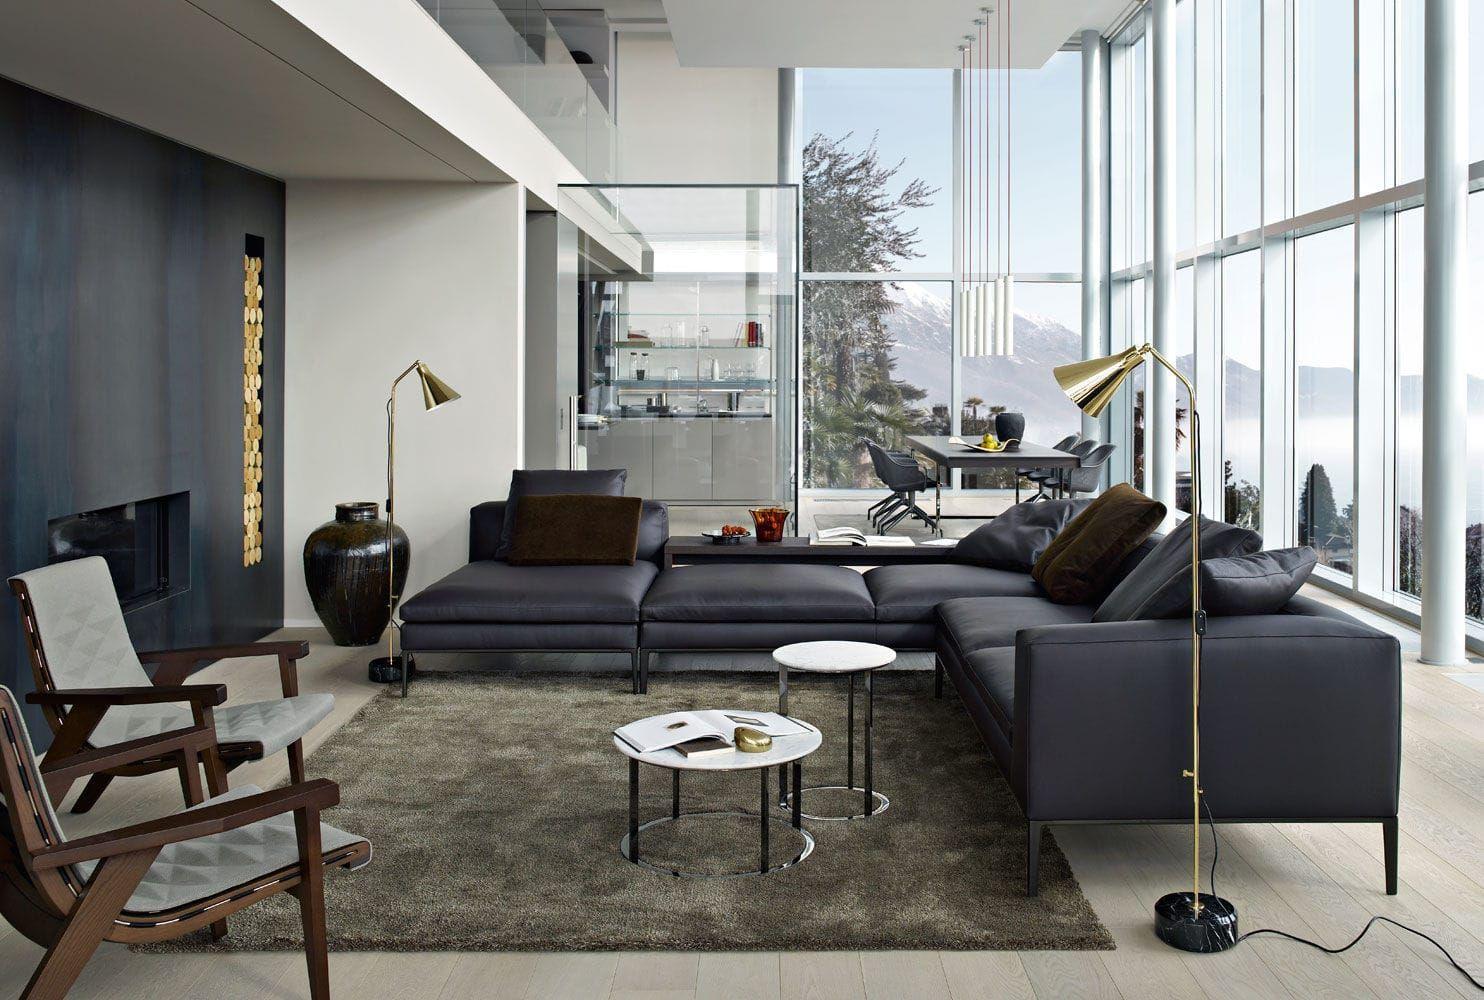 B B Möbel b b italia möbel und dekoration archiexpo sofas leder